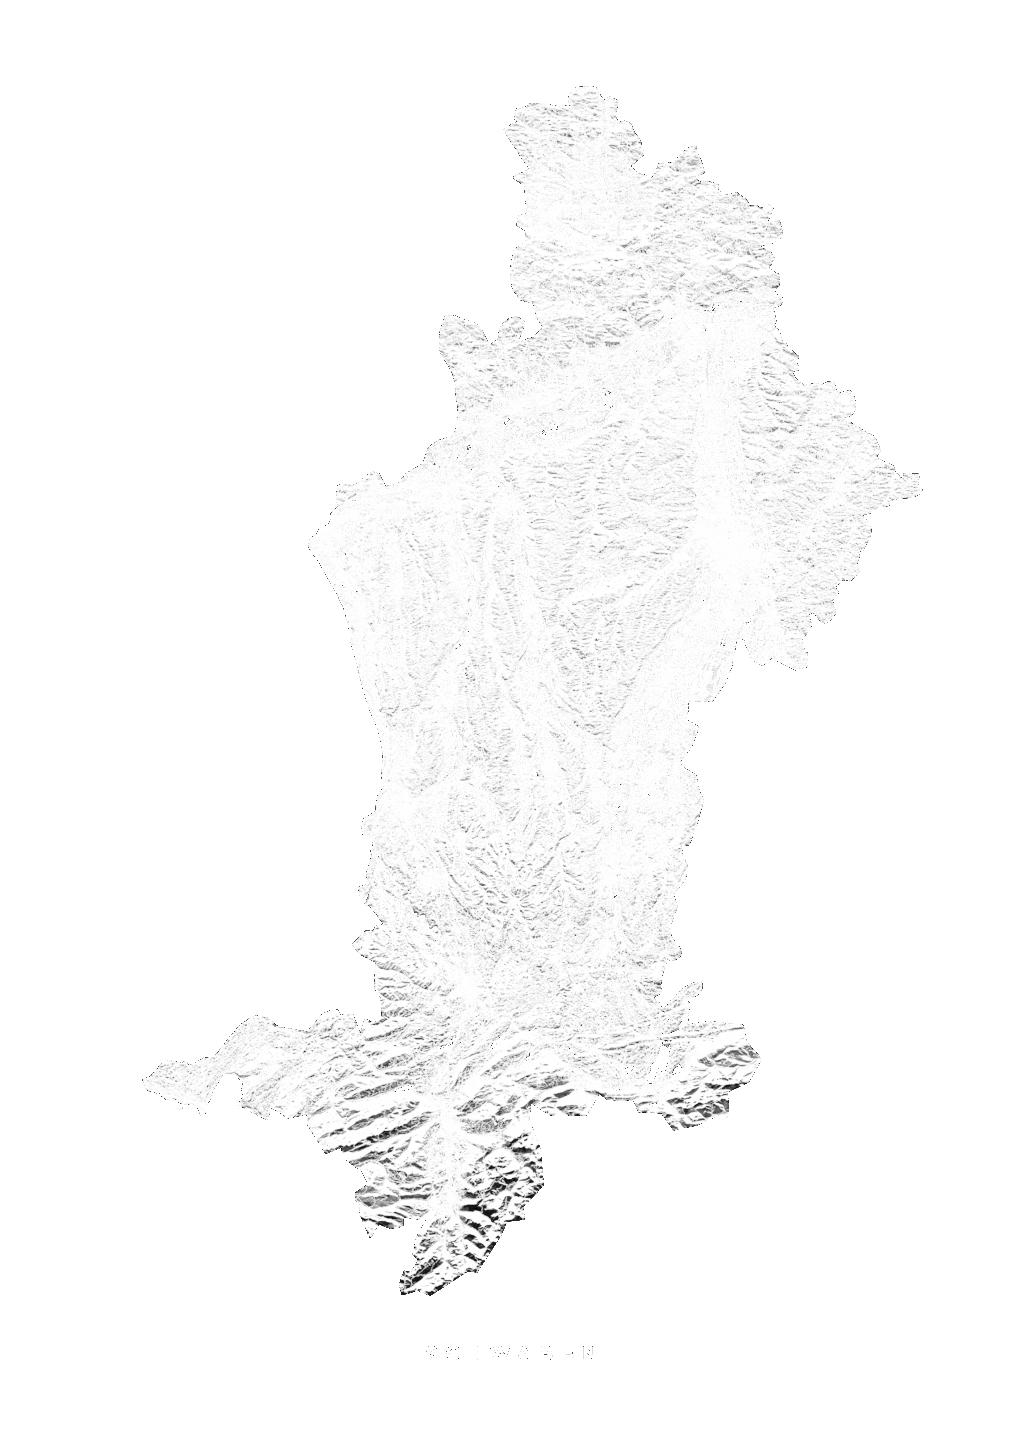 Schwaben wall map